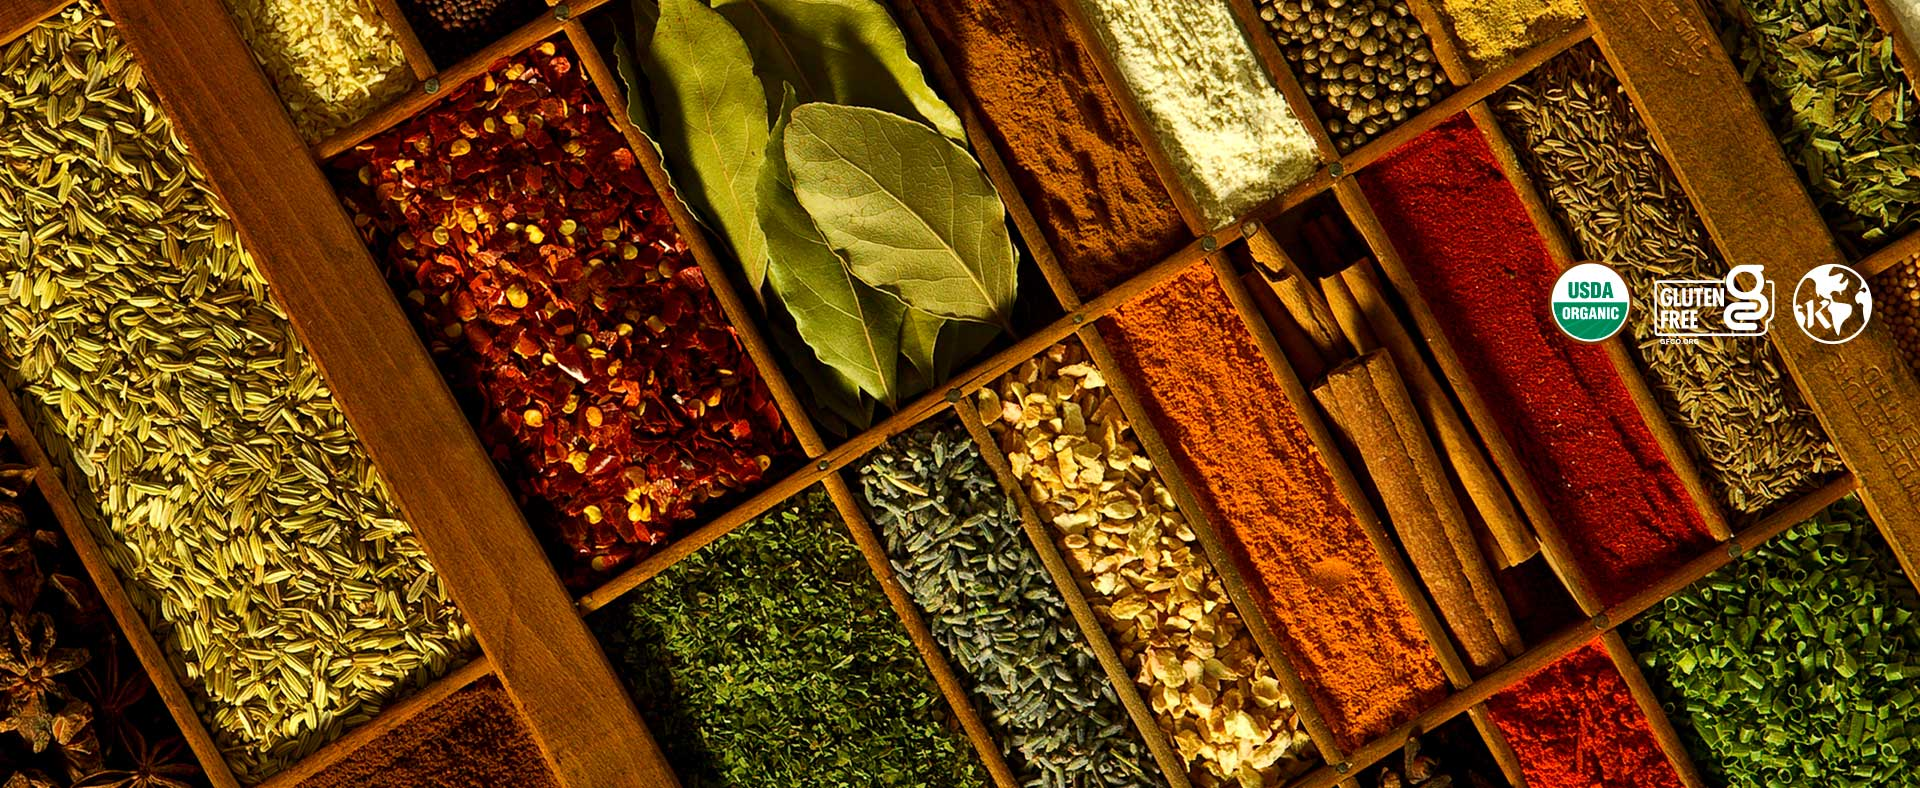 Premium, gourmet organic spices & herbs